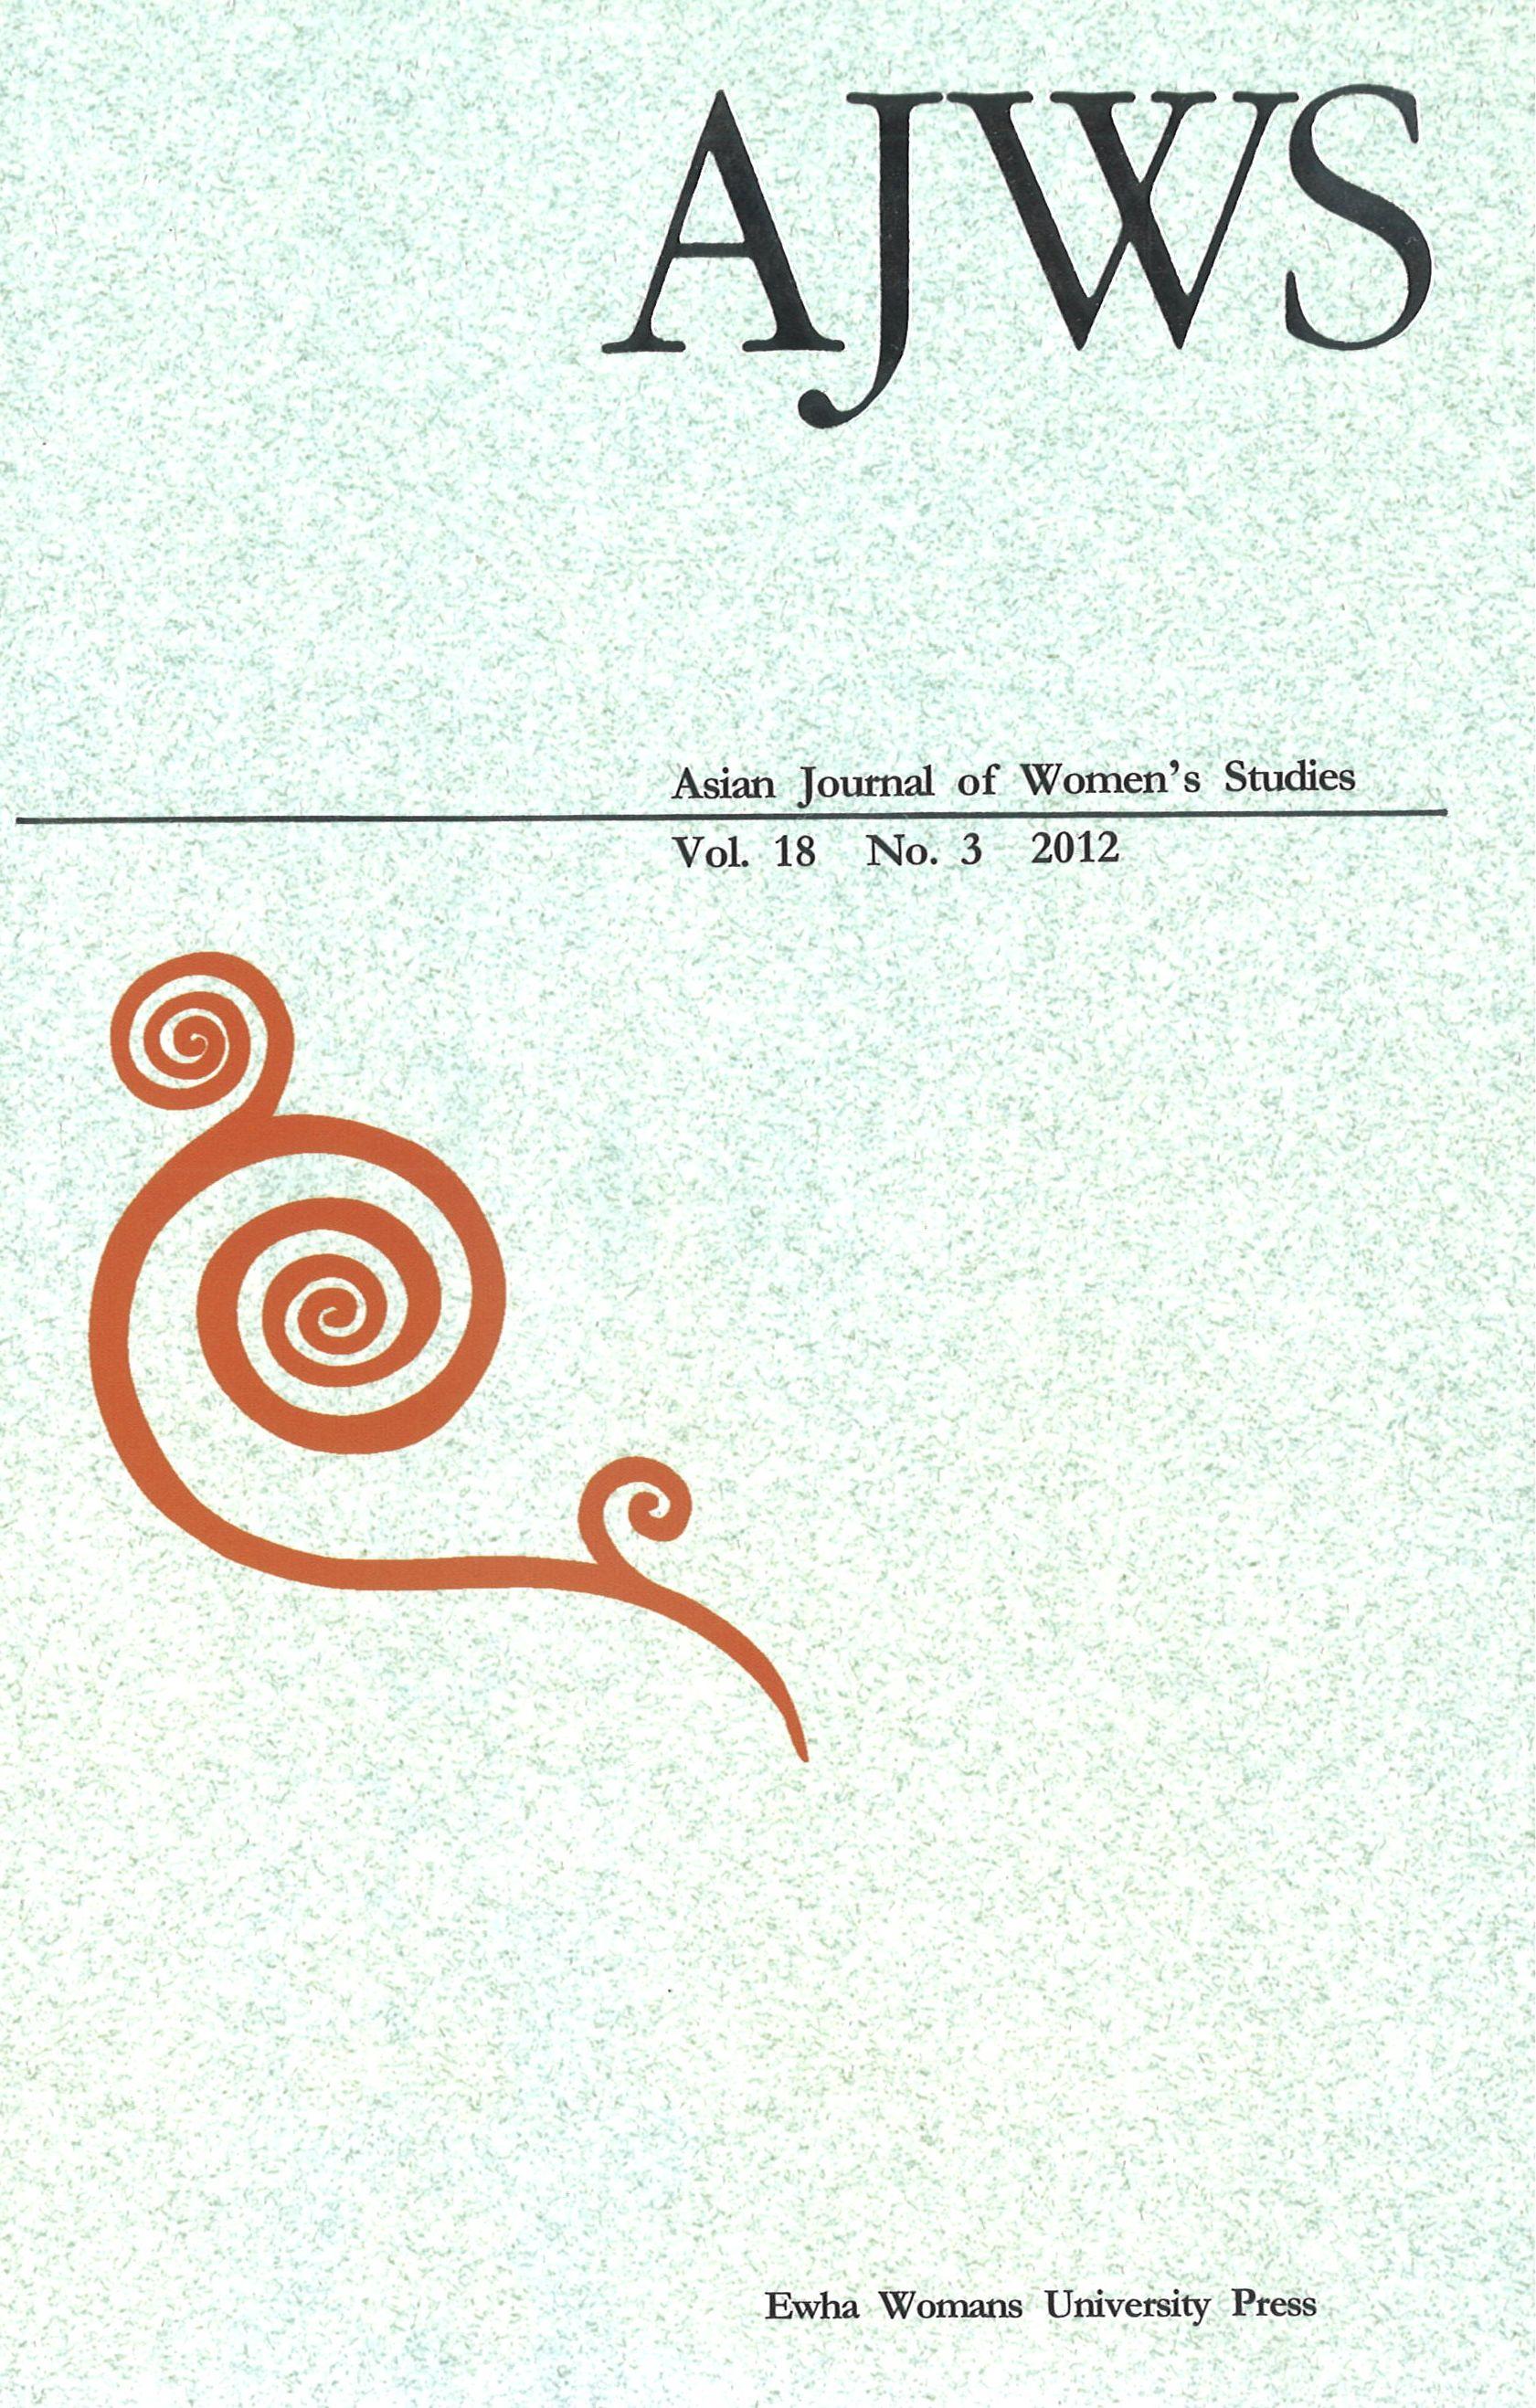 Asian journal of women's studies : AJWS